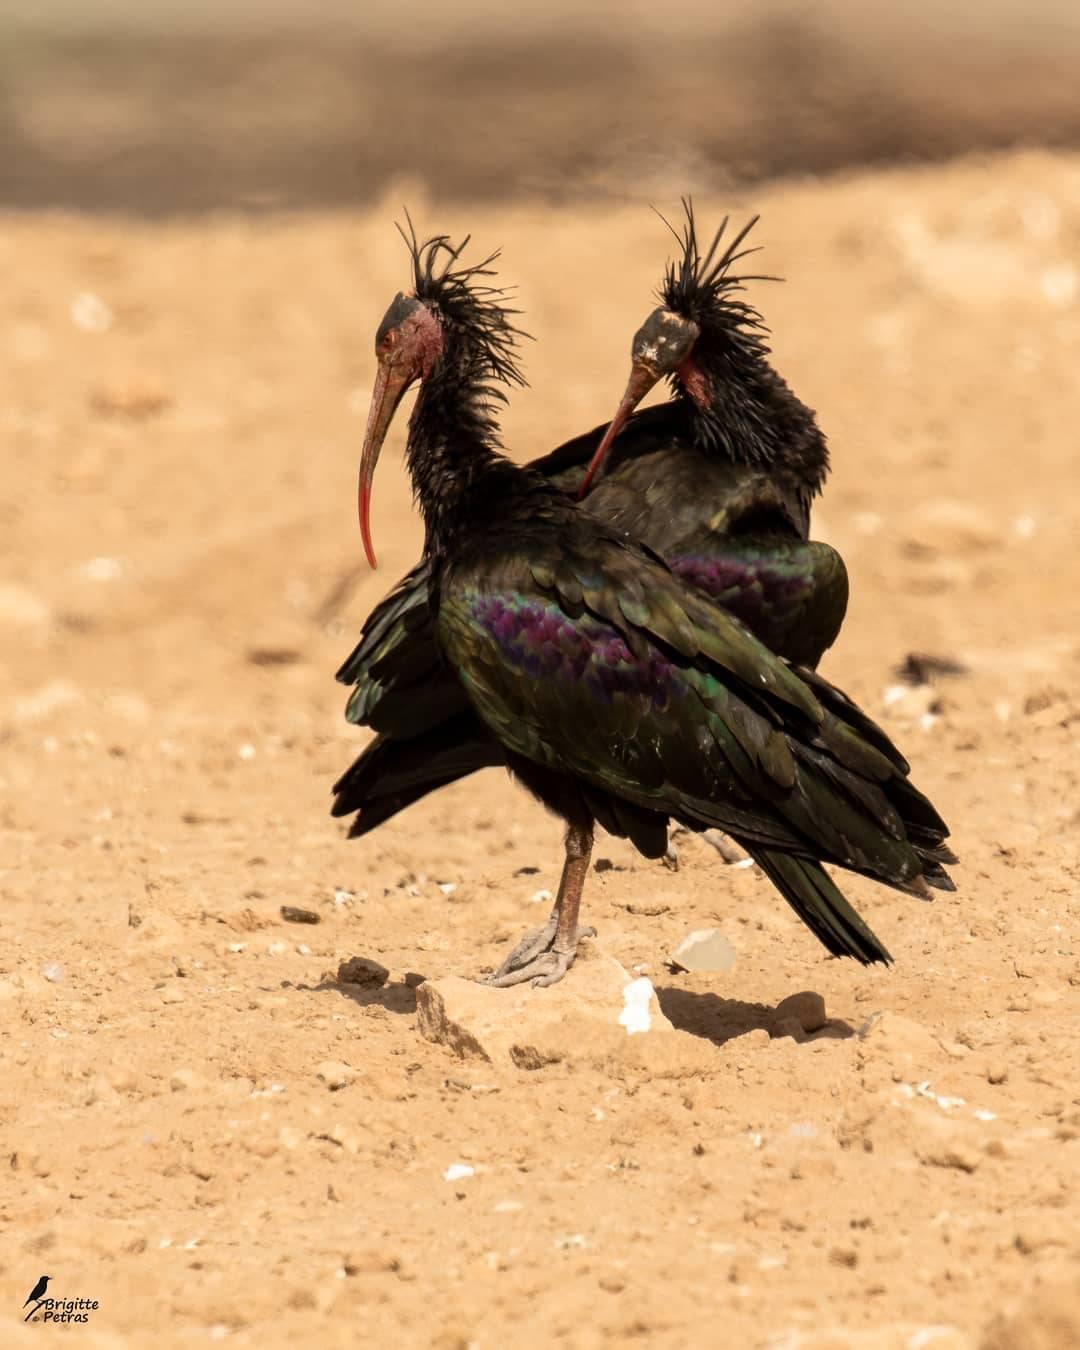 Northern Bald Ibis, Souss-Massa National Park, Agadir, Morocco